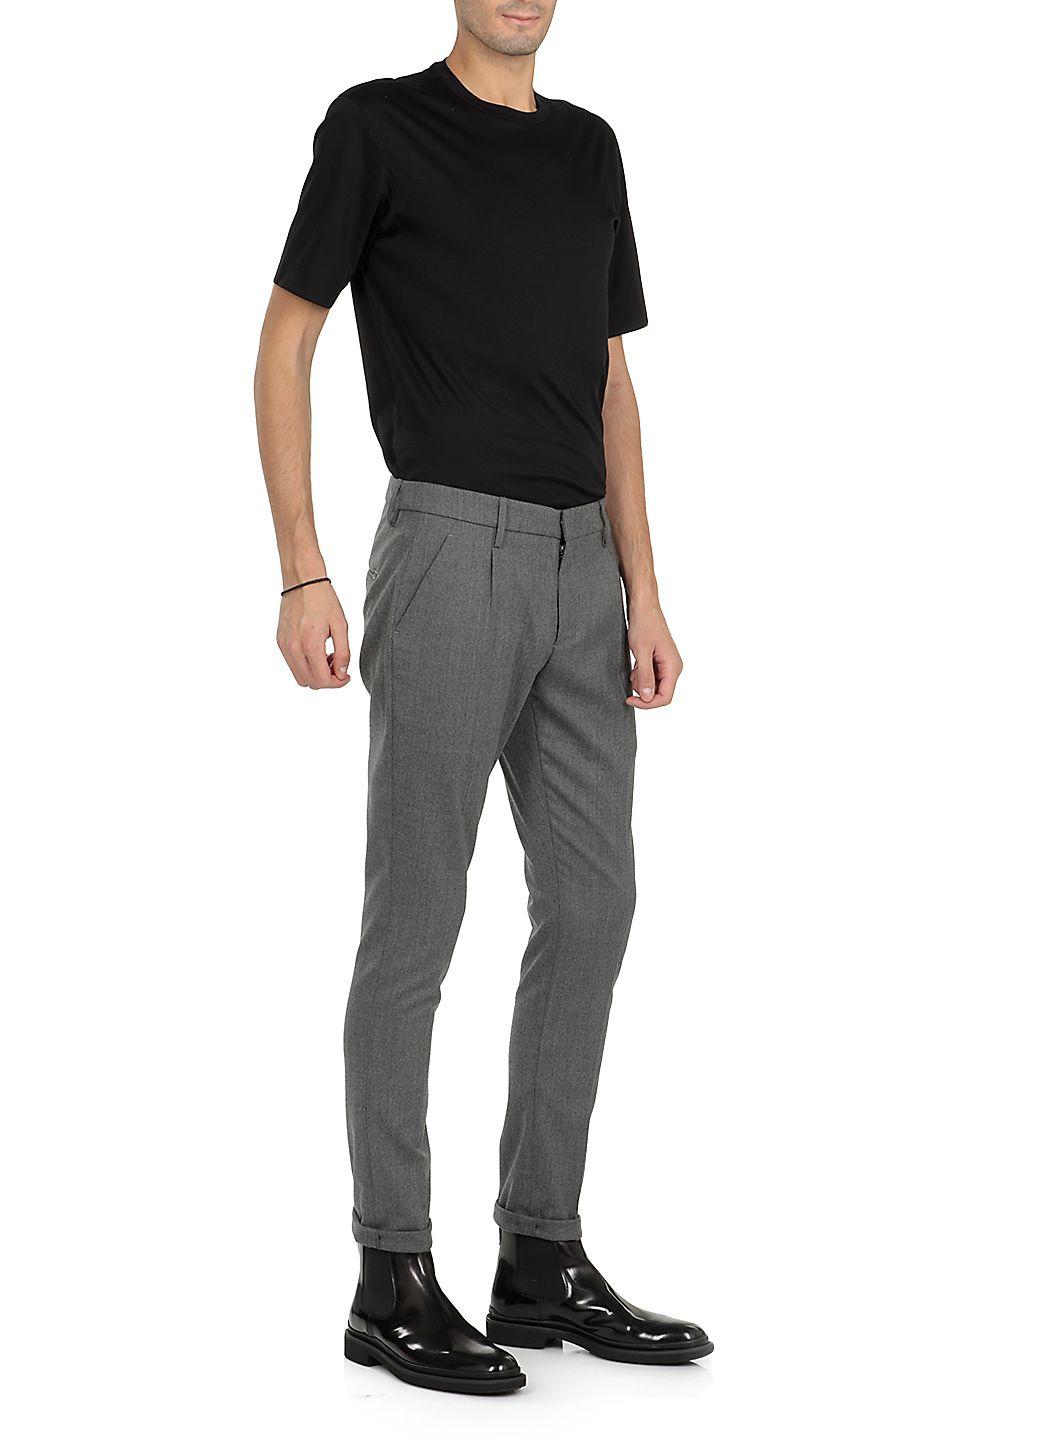 Gaubert pinces pantalone